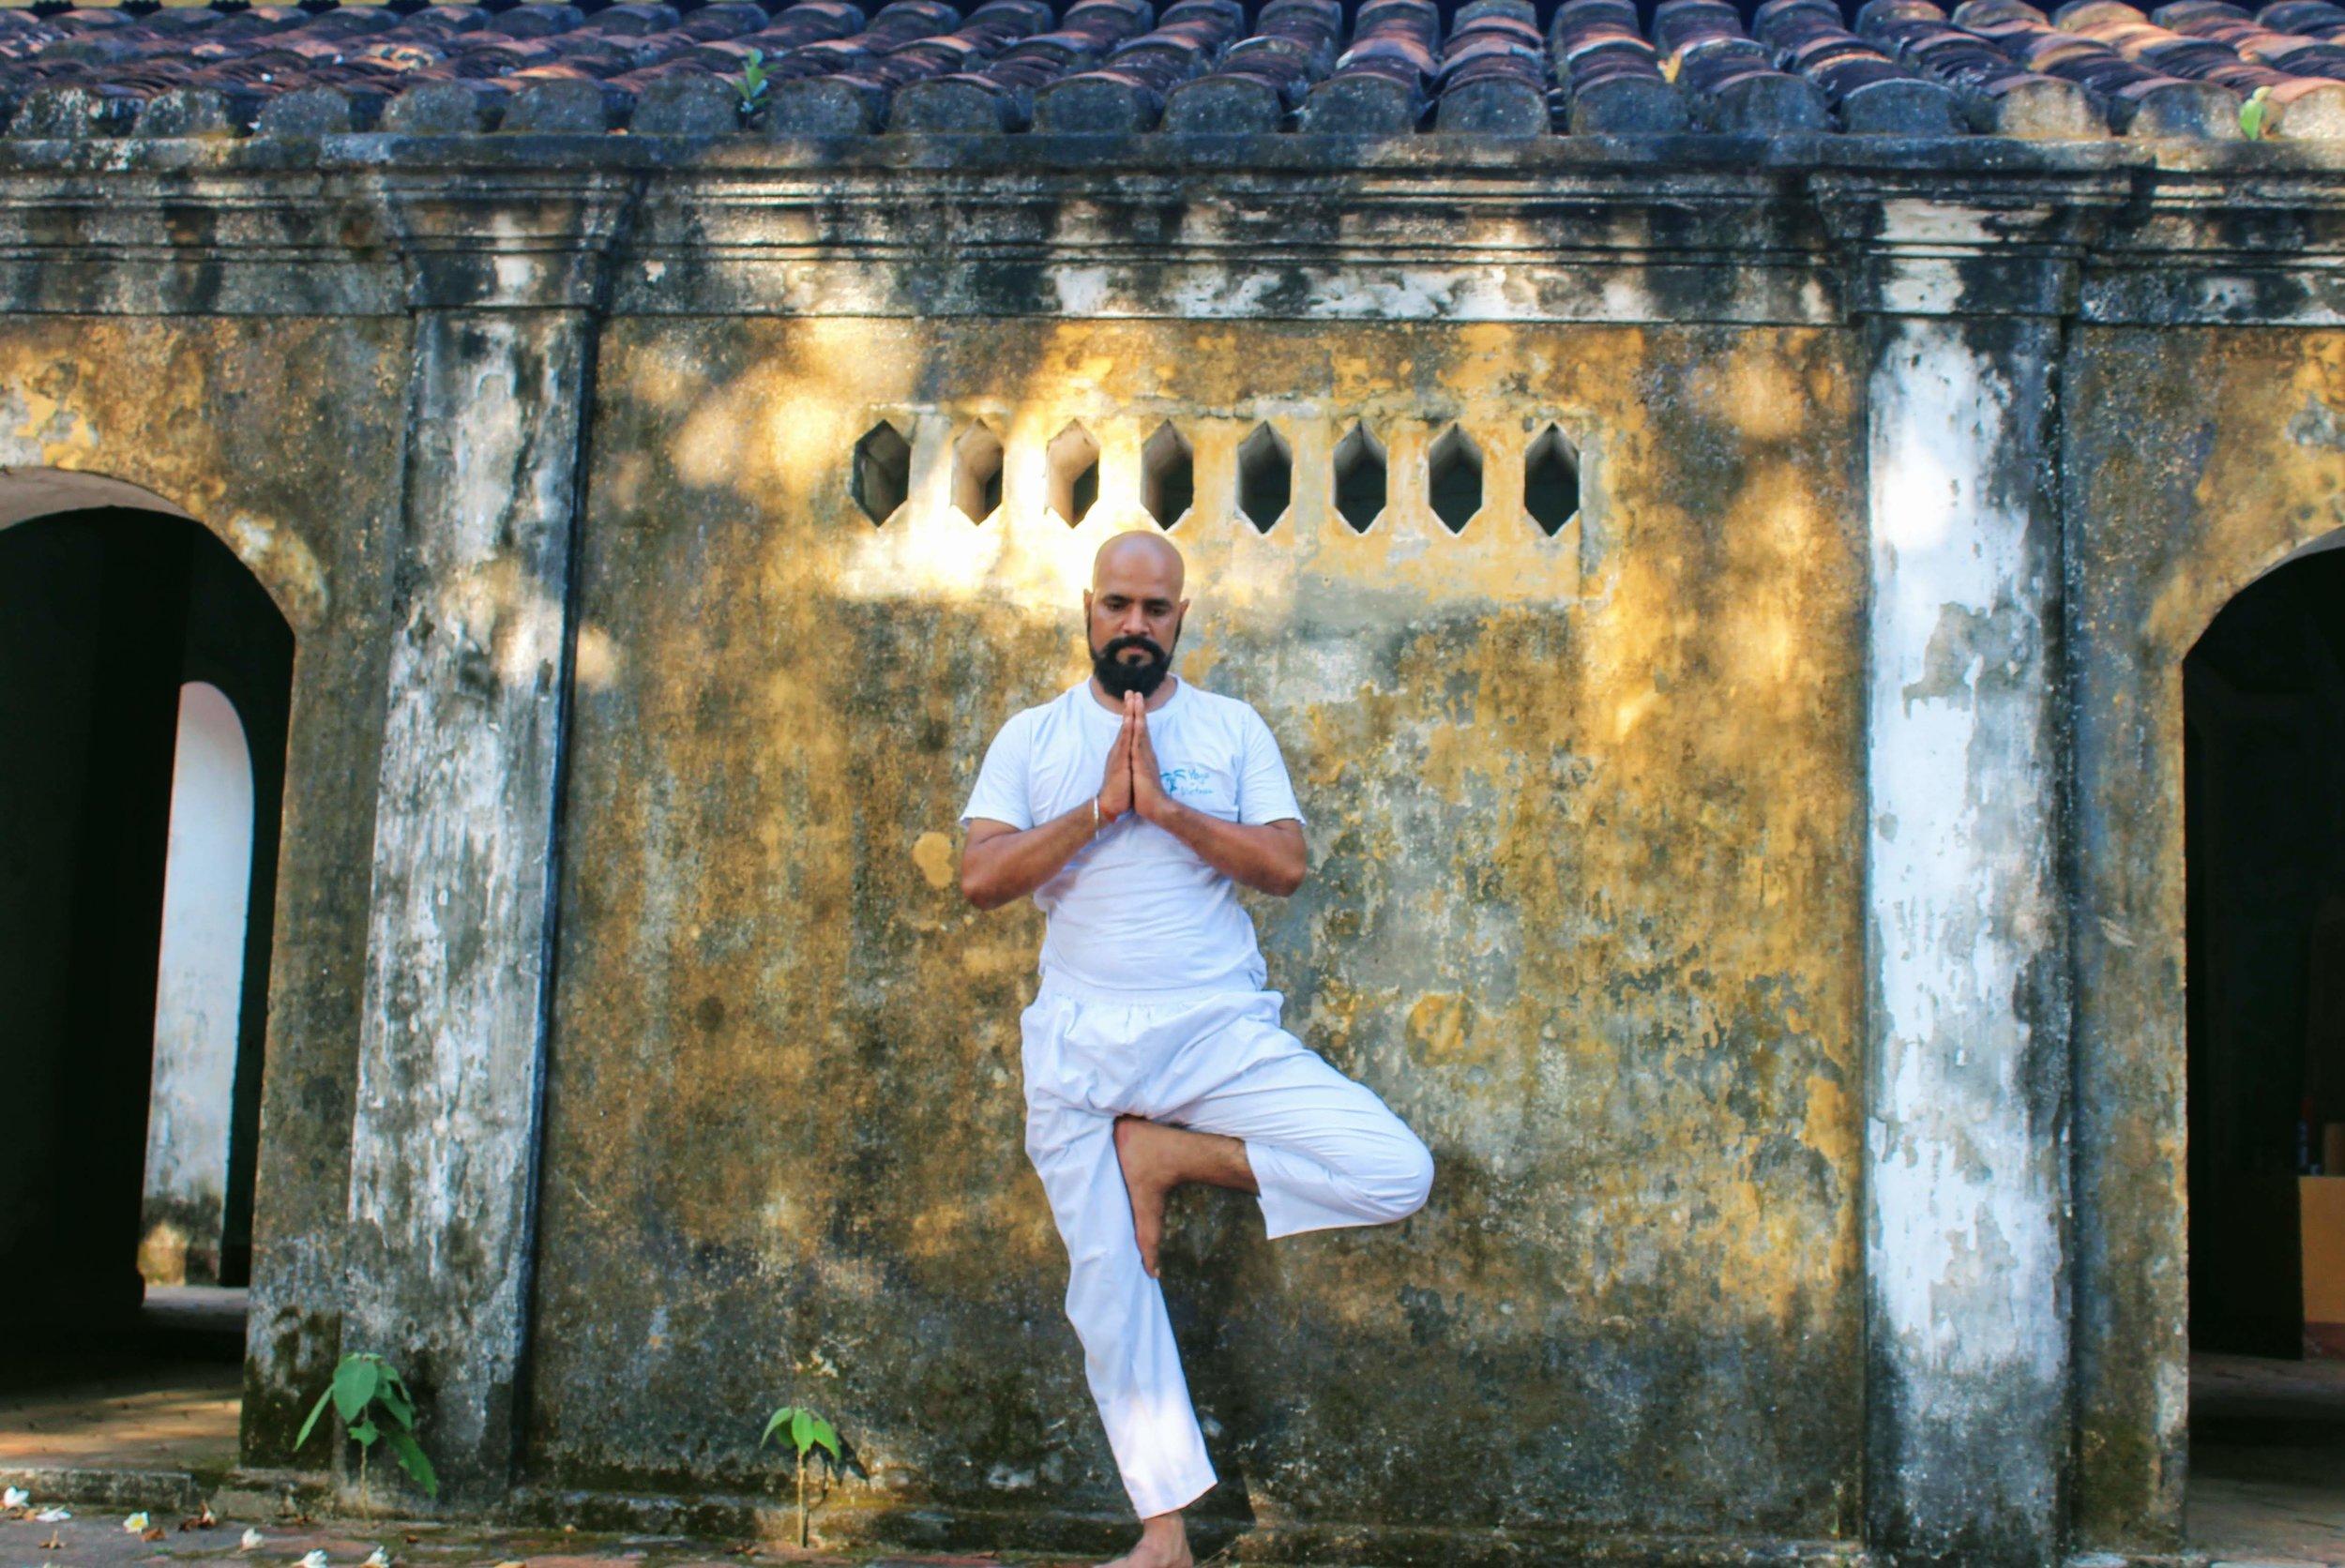 Mindful-Living-Yoga-Retreat-Cham-Island-Banner.jpg